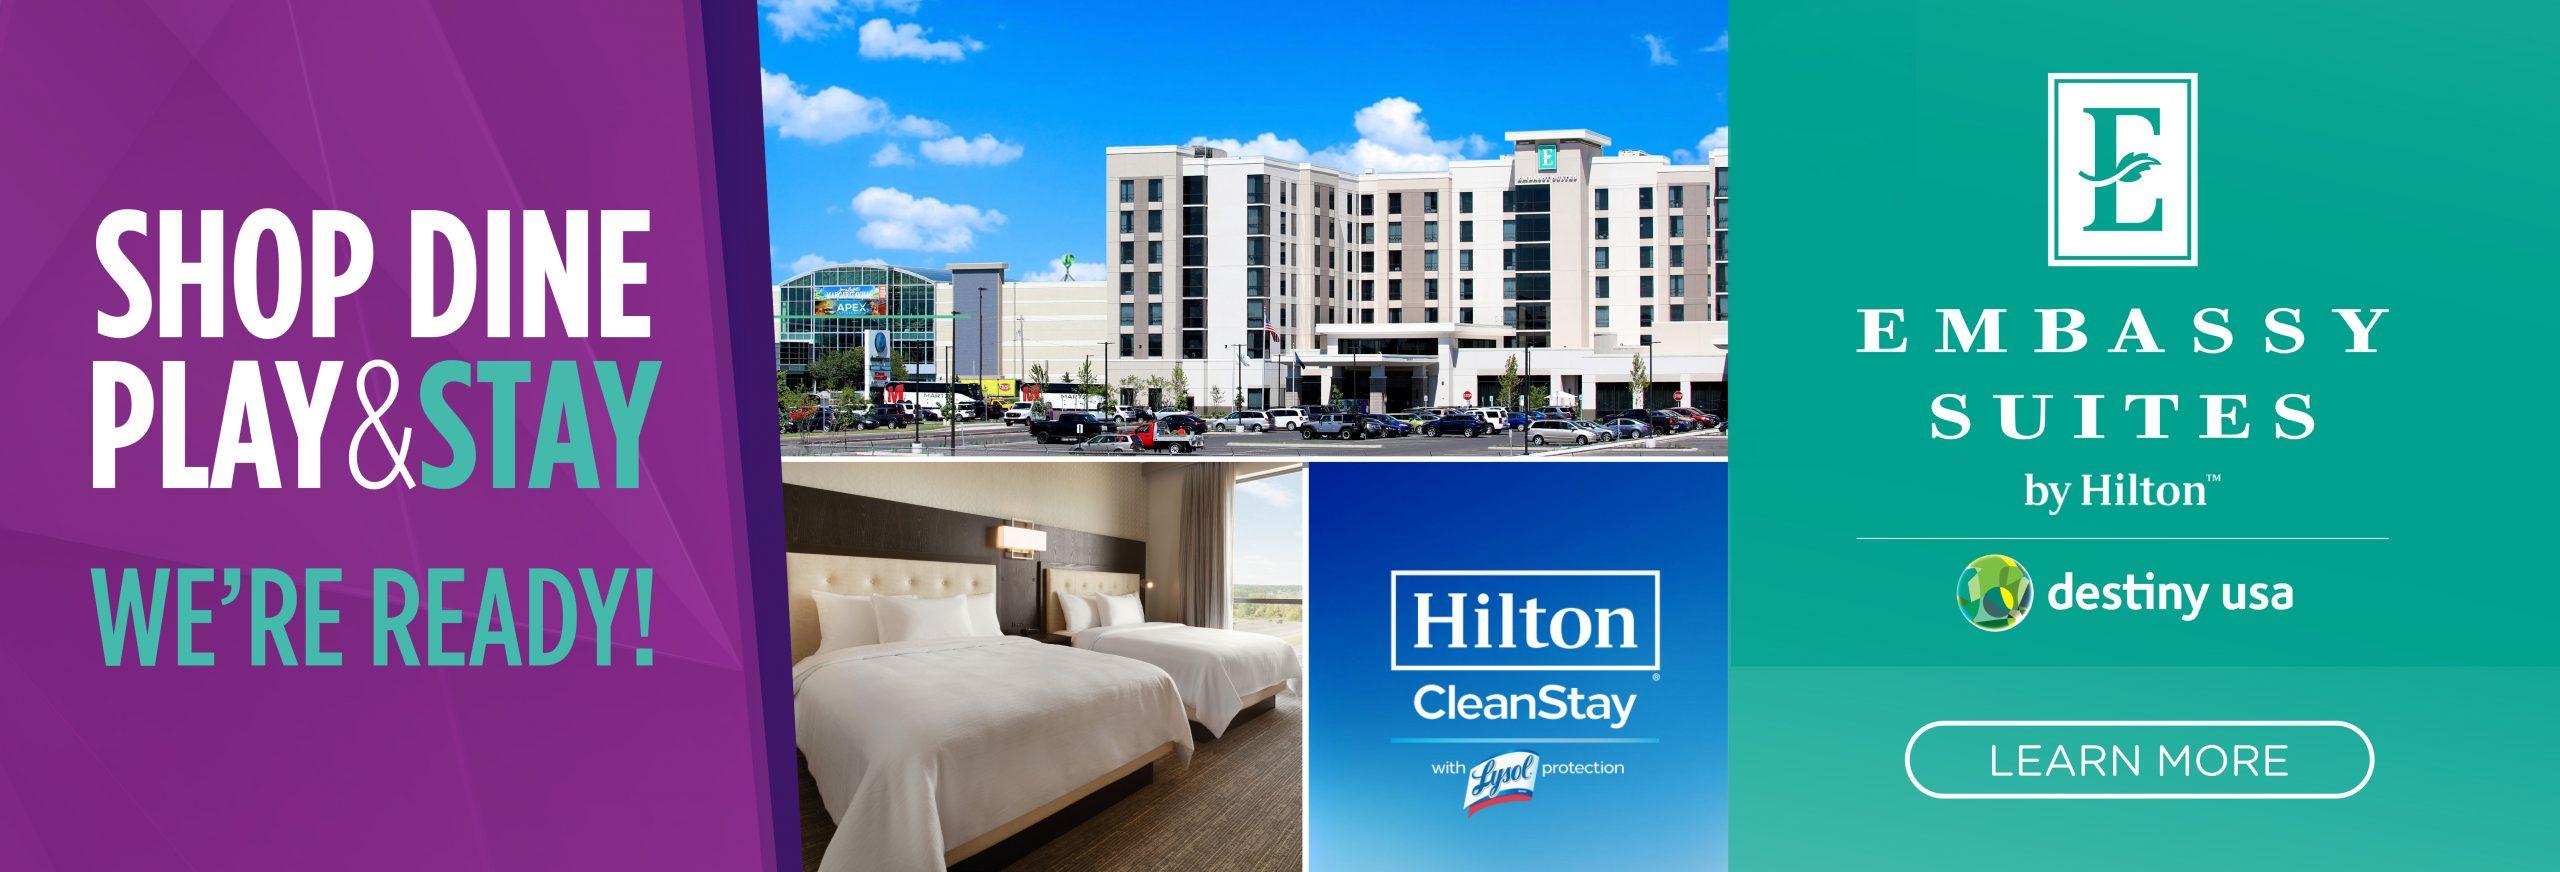 2020 08 27 Hotel HomepageSlider 1600x545 1